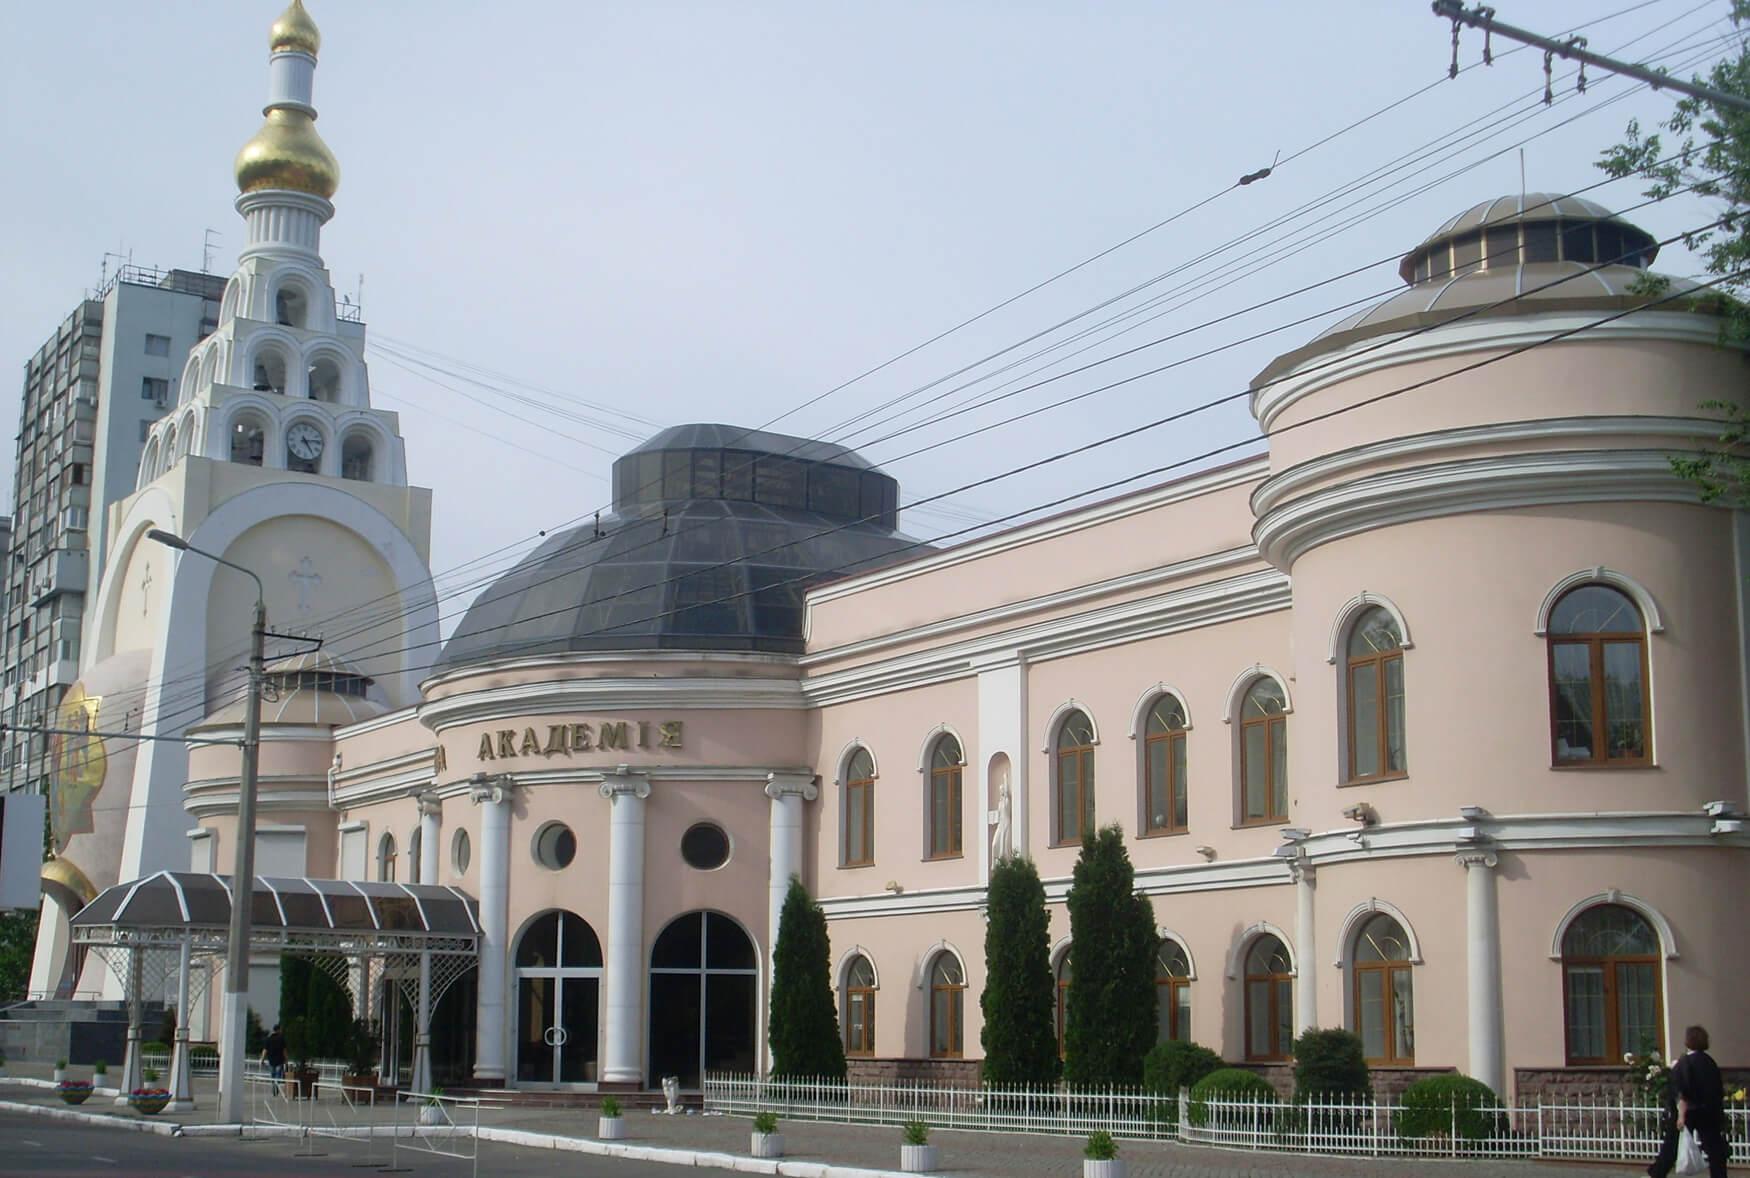 Odessa Ulusal Hukuk Akademisi /Odessa National Academy of Law